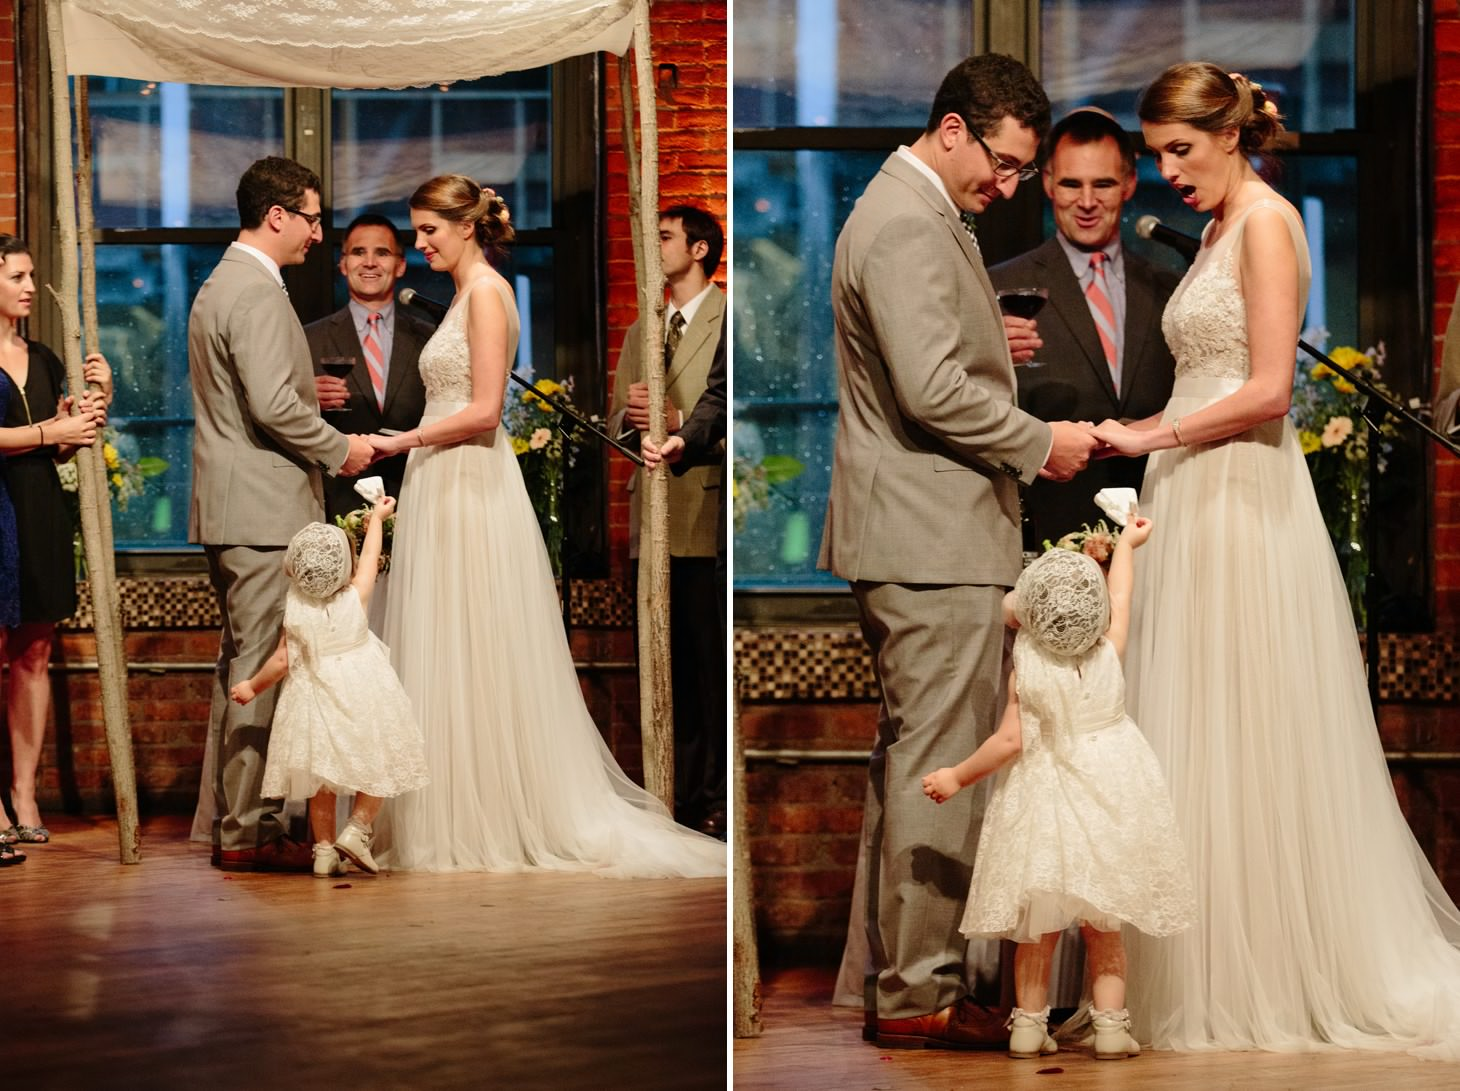 025-nyc-dumbo-loft-brooklyn-wedding-photographer-smitten-chickens-photo-.jpg